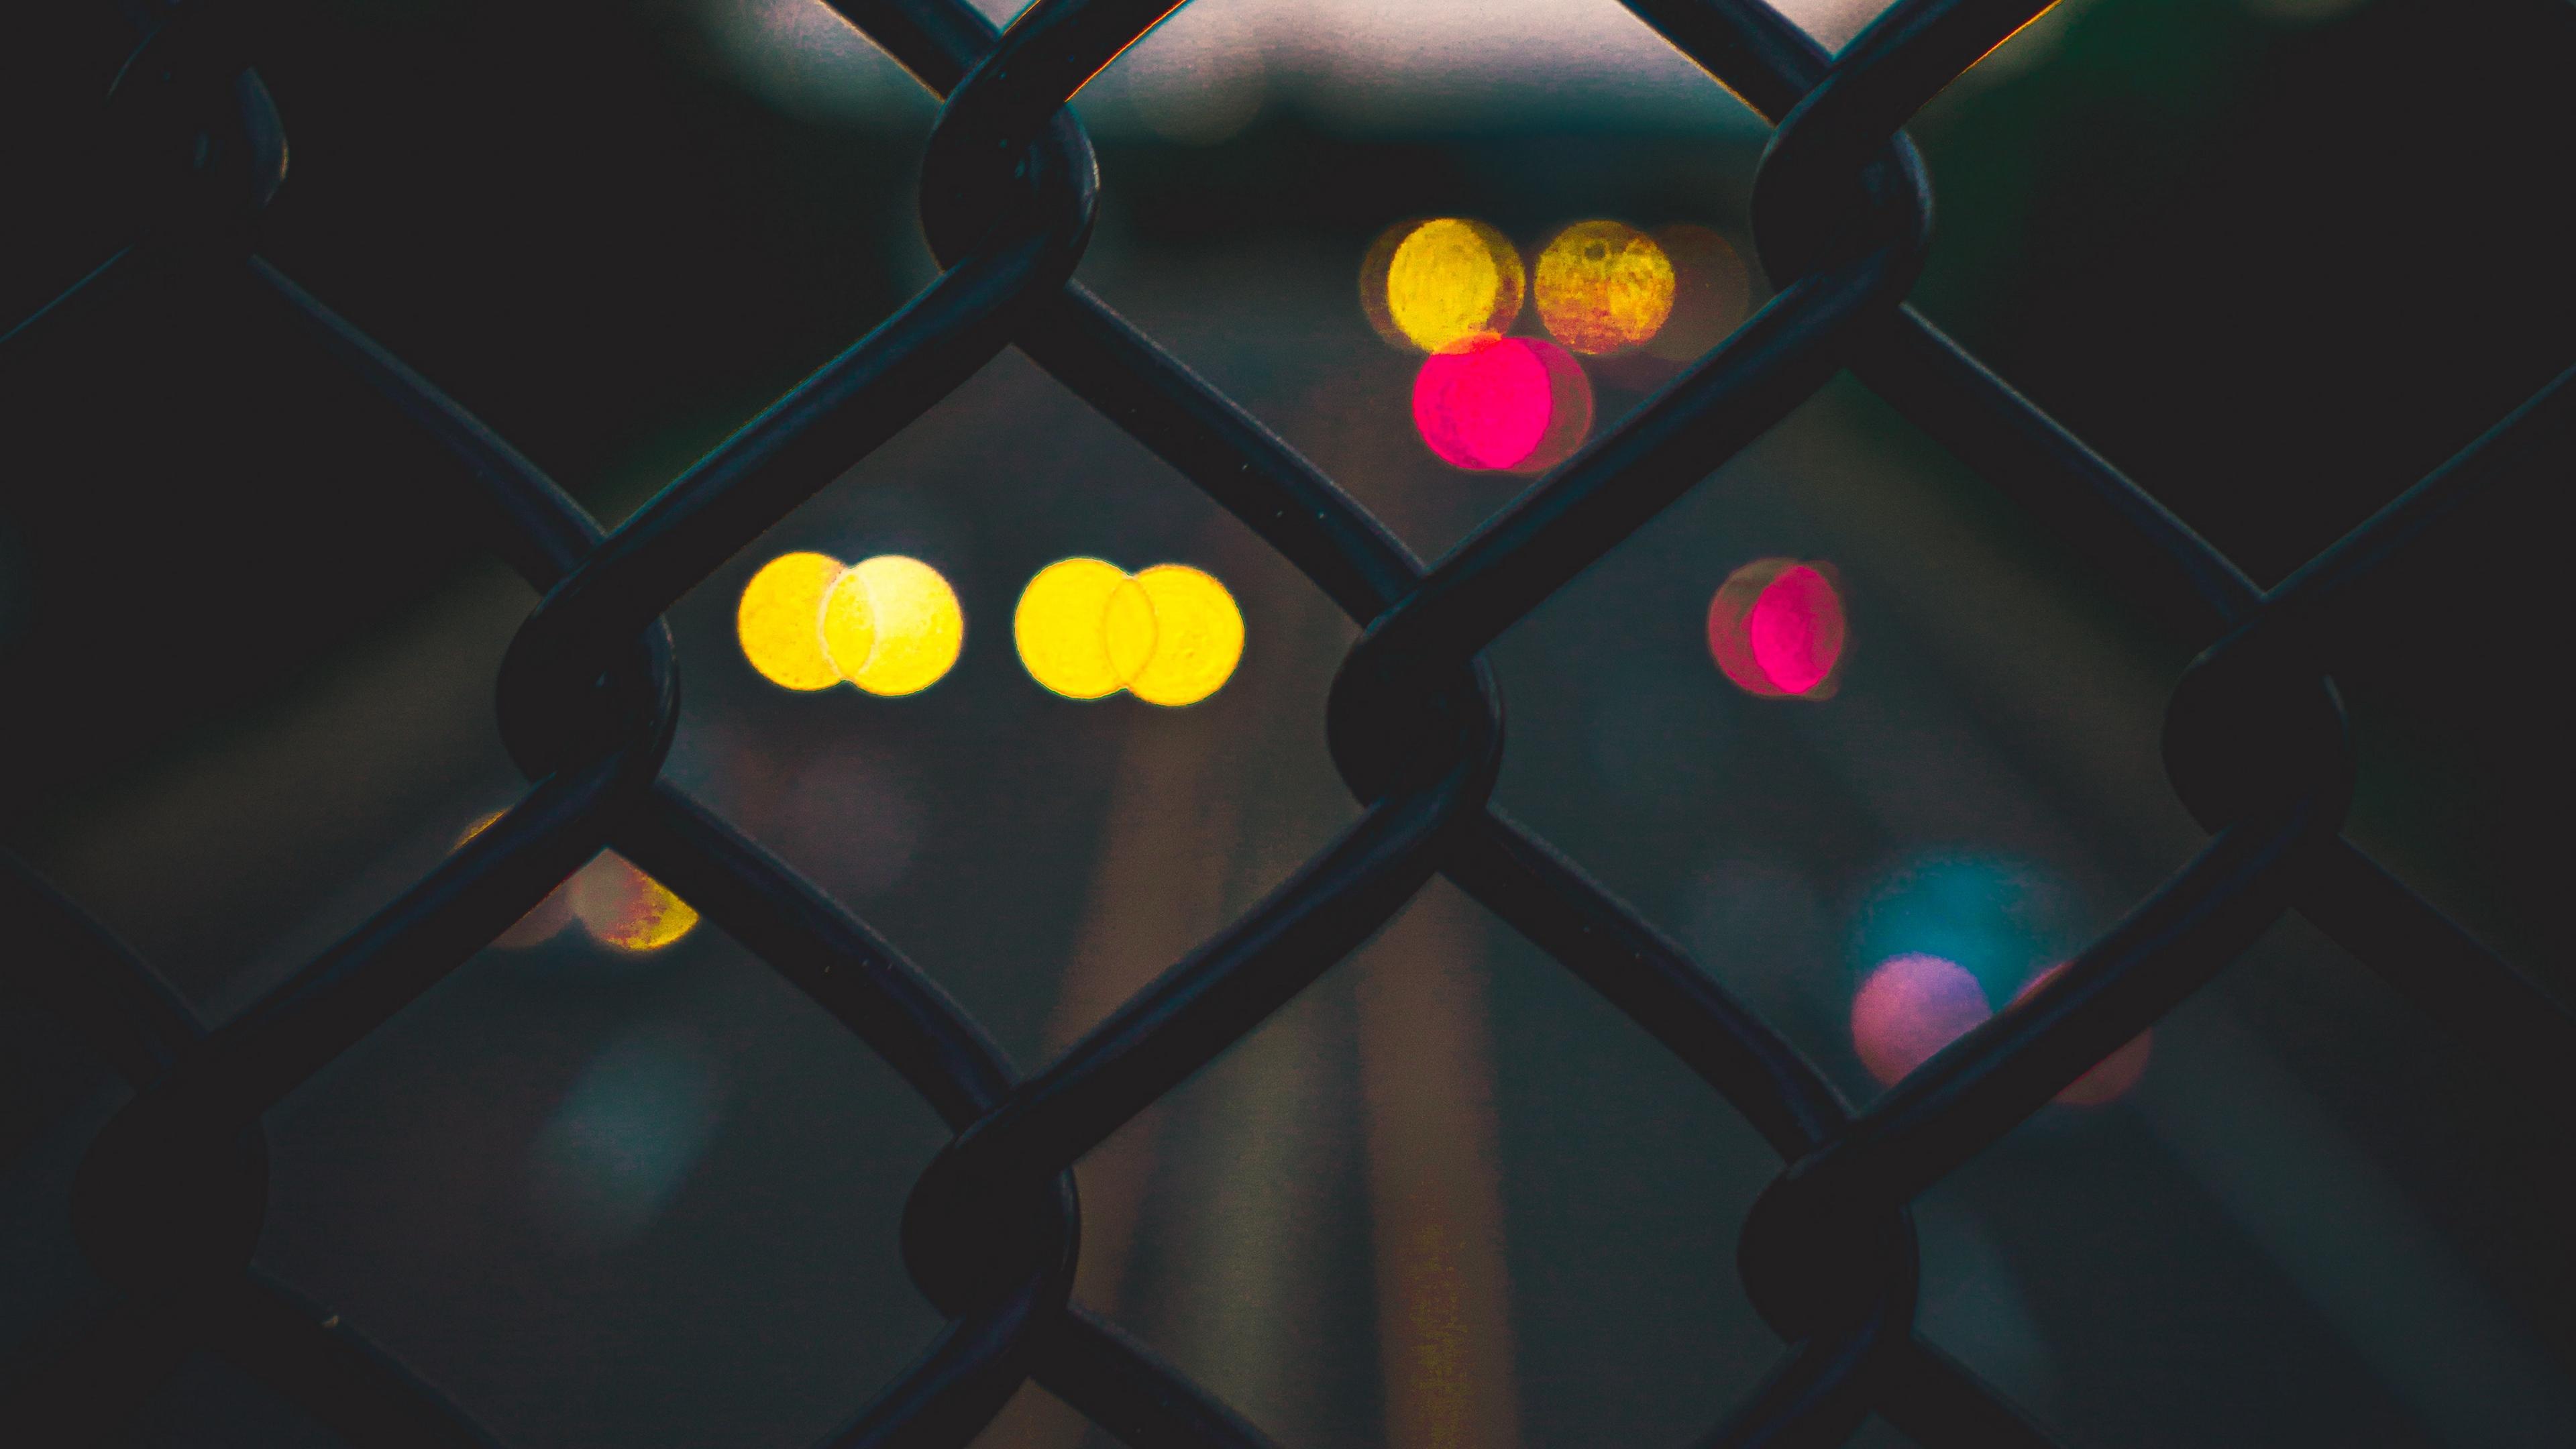 lattice fence blur glare 4k 1540575607 - lattice, fence, blur, glare 4k - lattice, fence, Blur